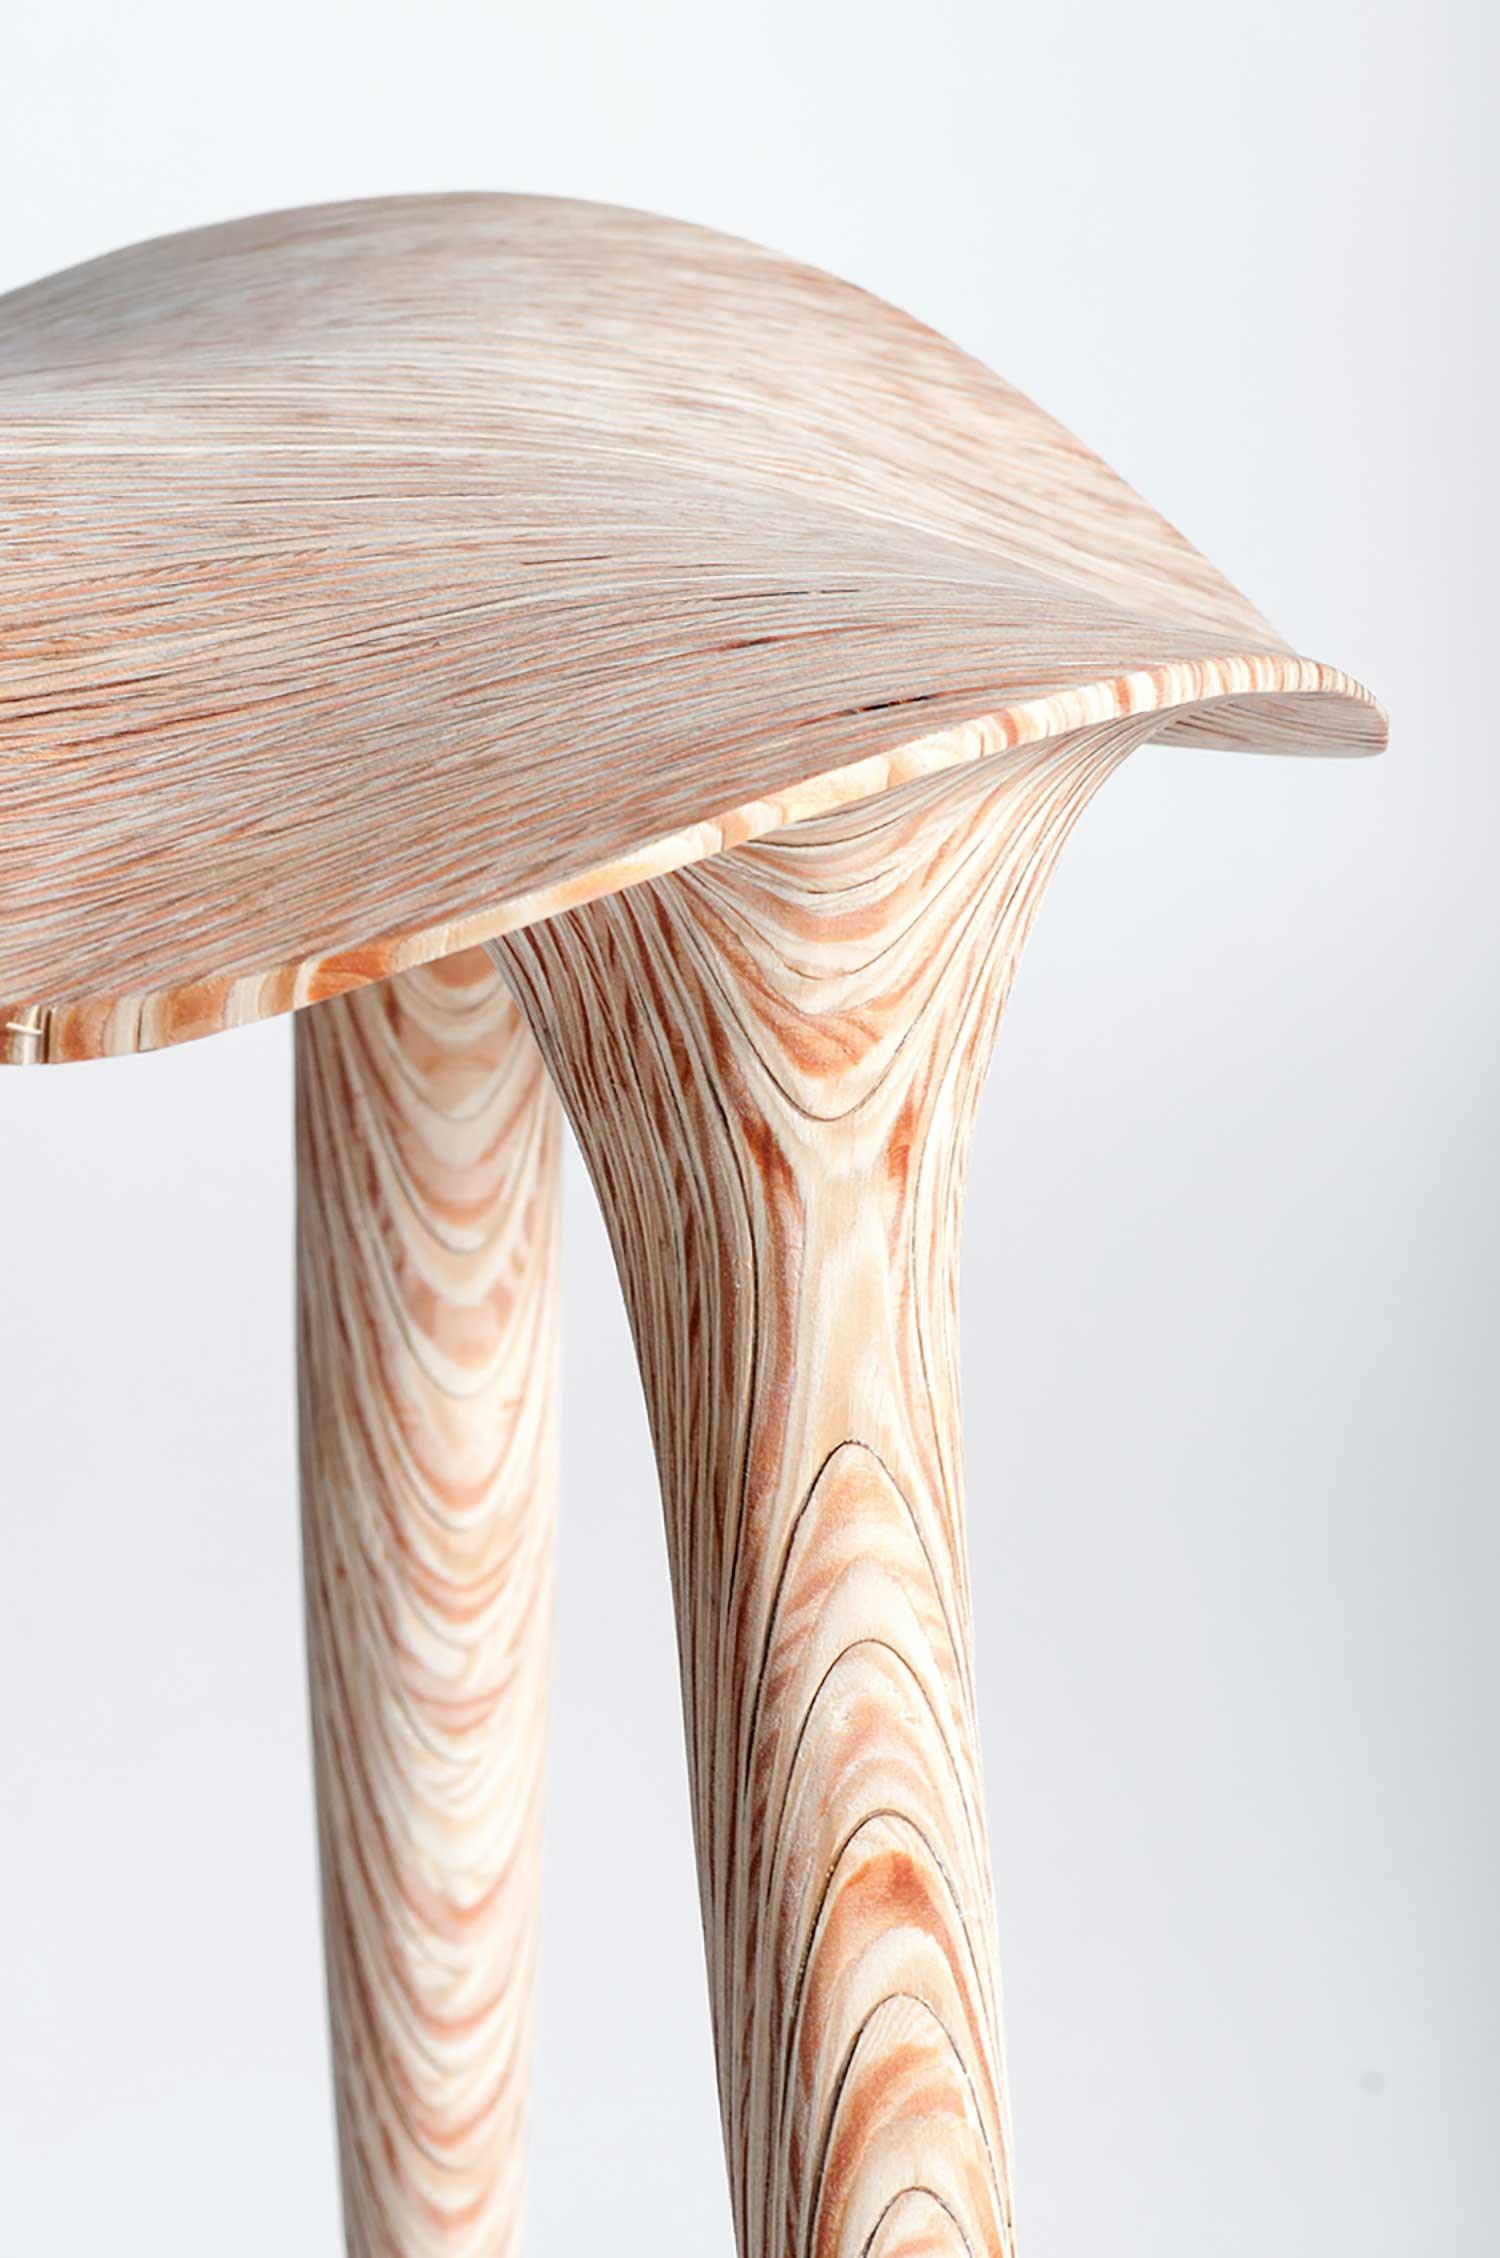 the-sadl-stool-4a